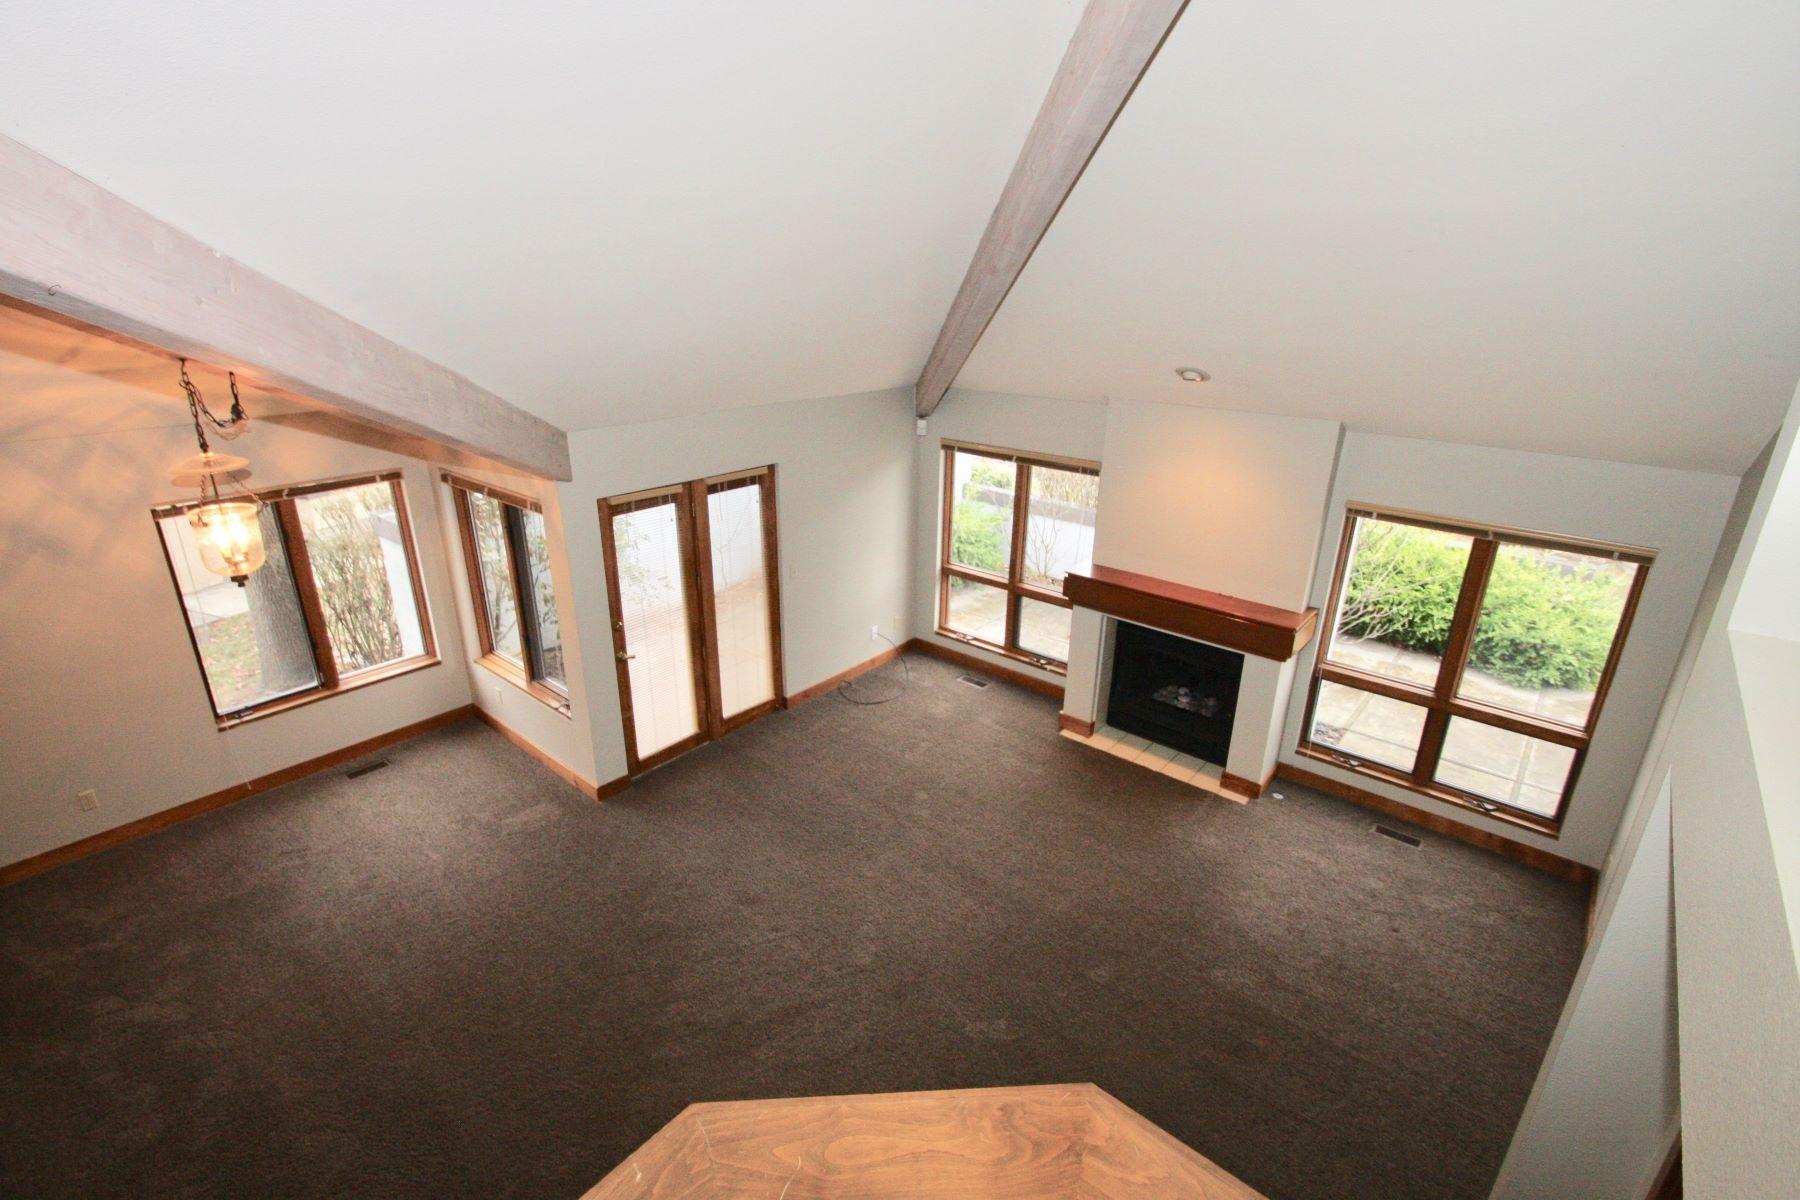 Additional photo for property listing at 1907 Springbrook, Boise 1907 Springbrook Boise, Idaho 83706